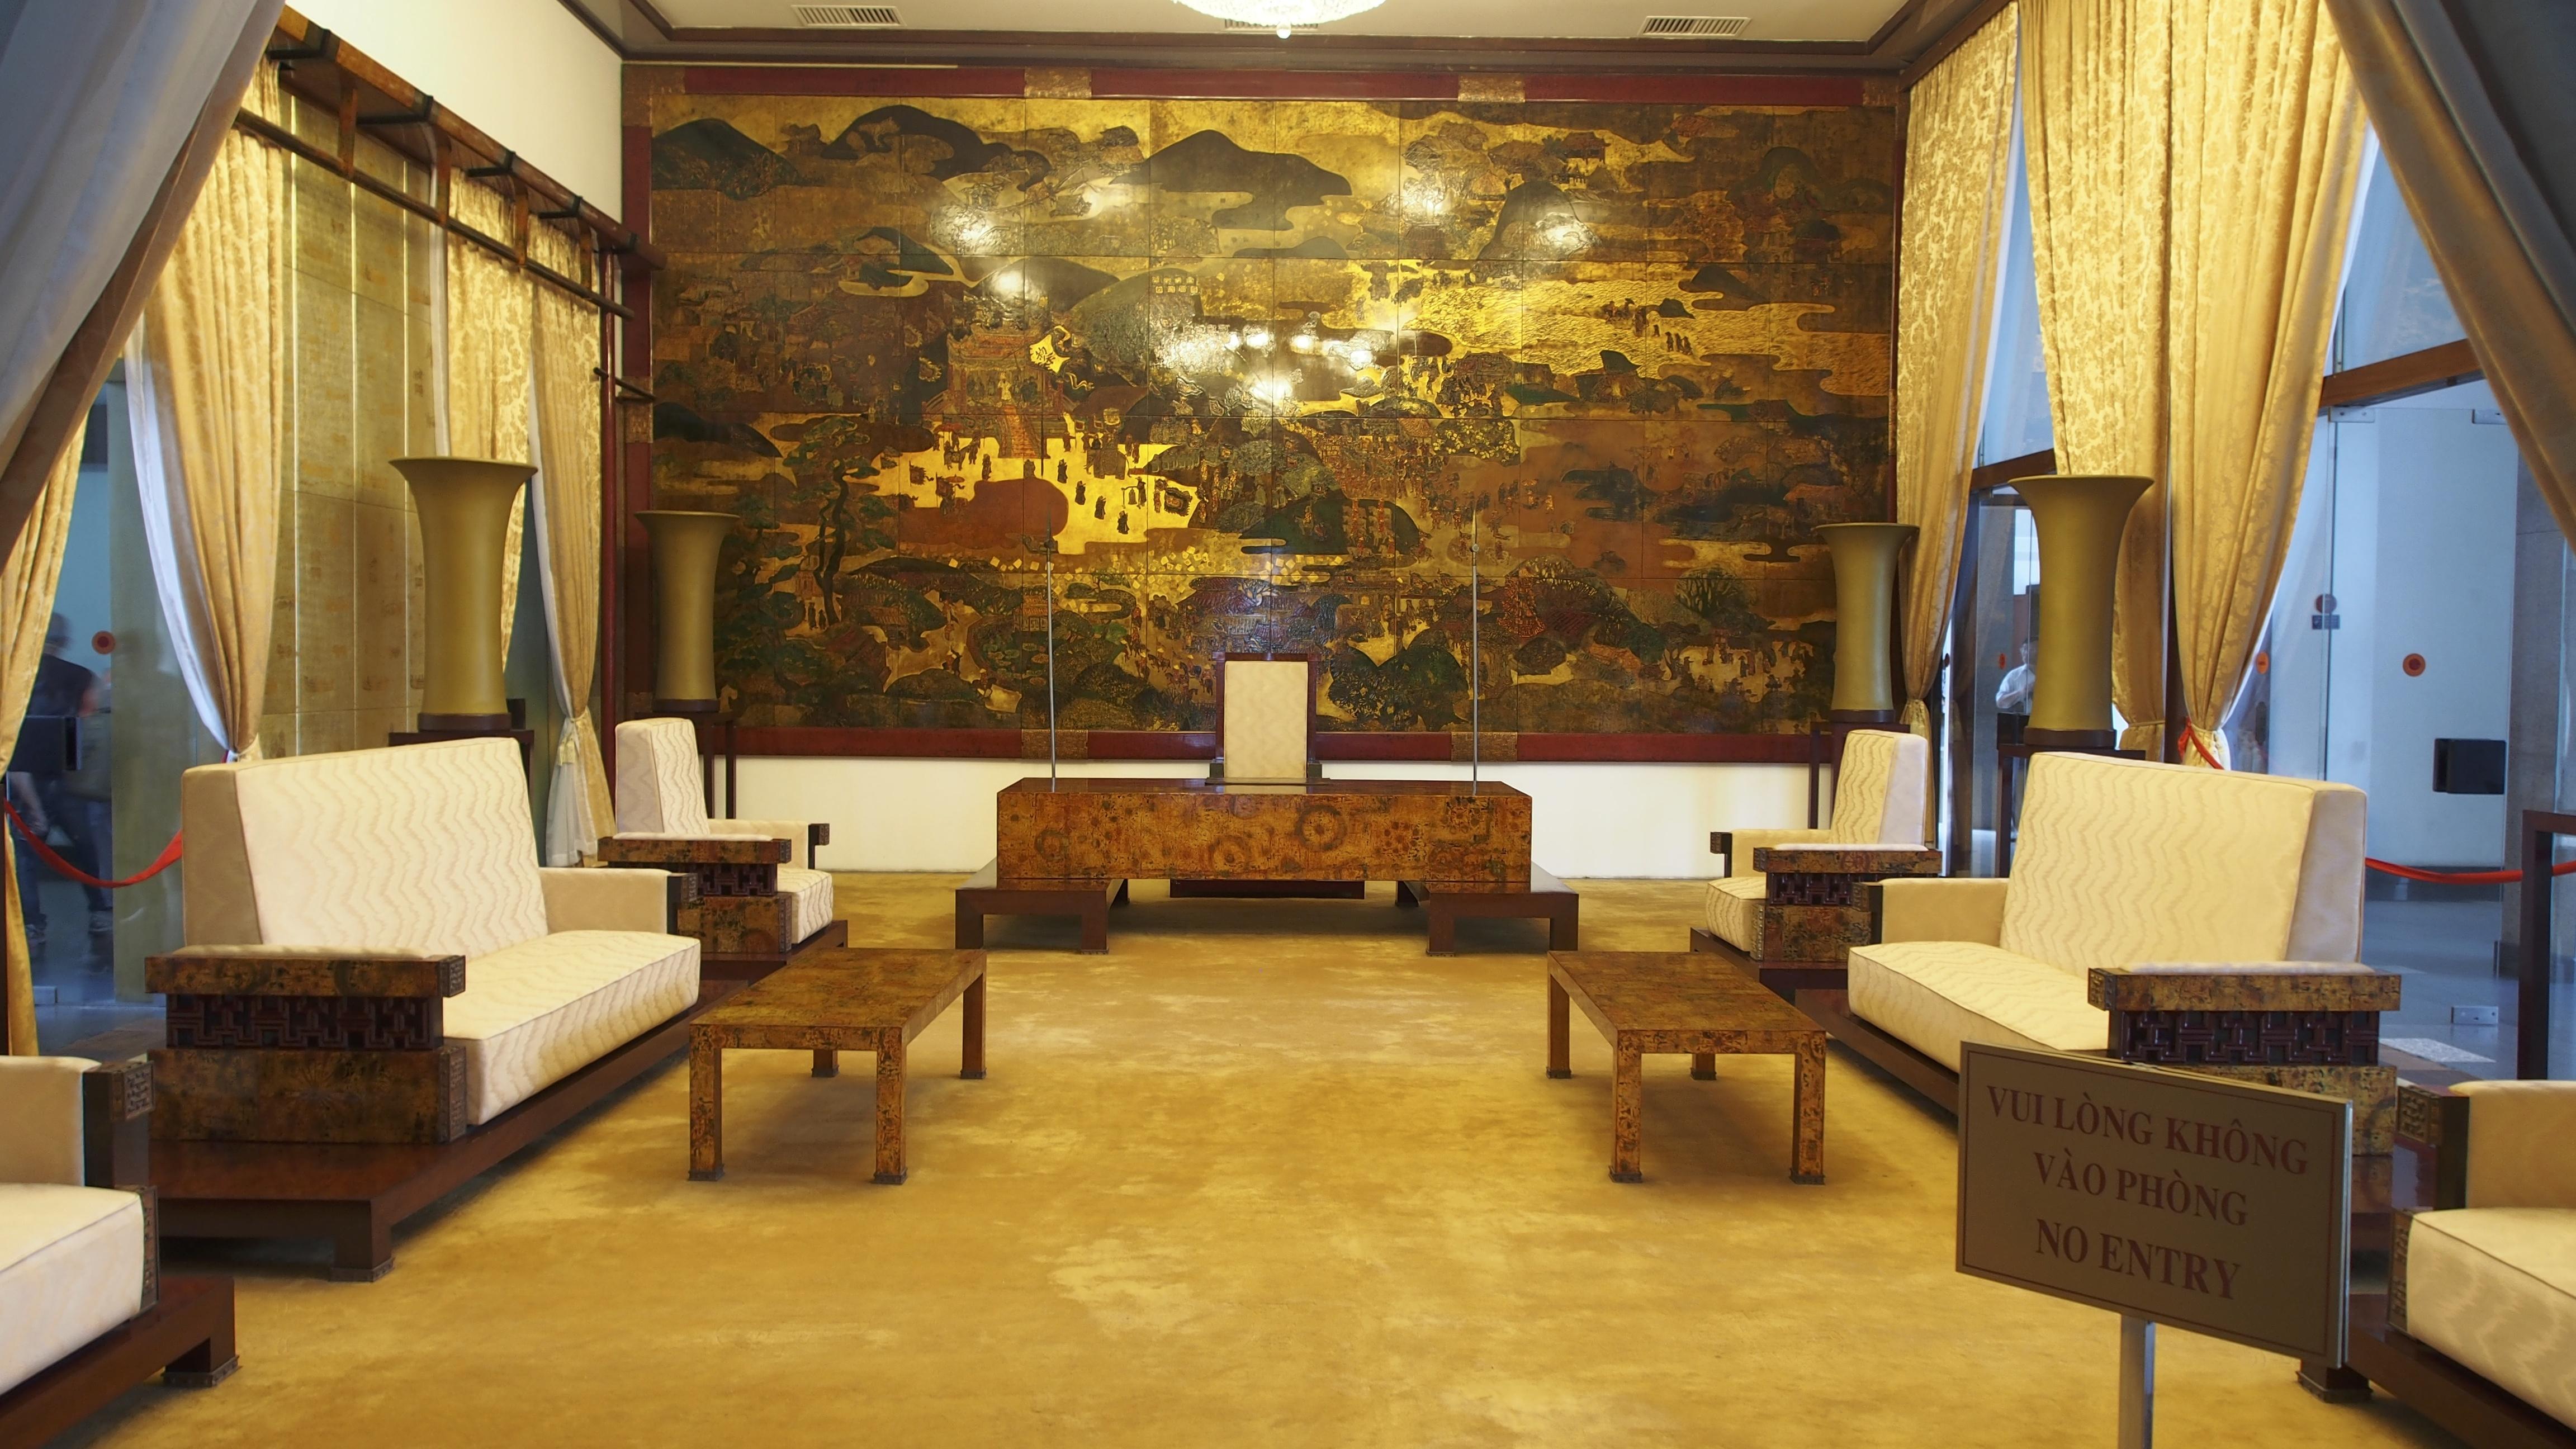 Interior of Reunification Palace